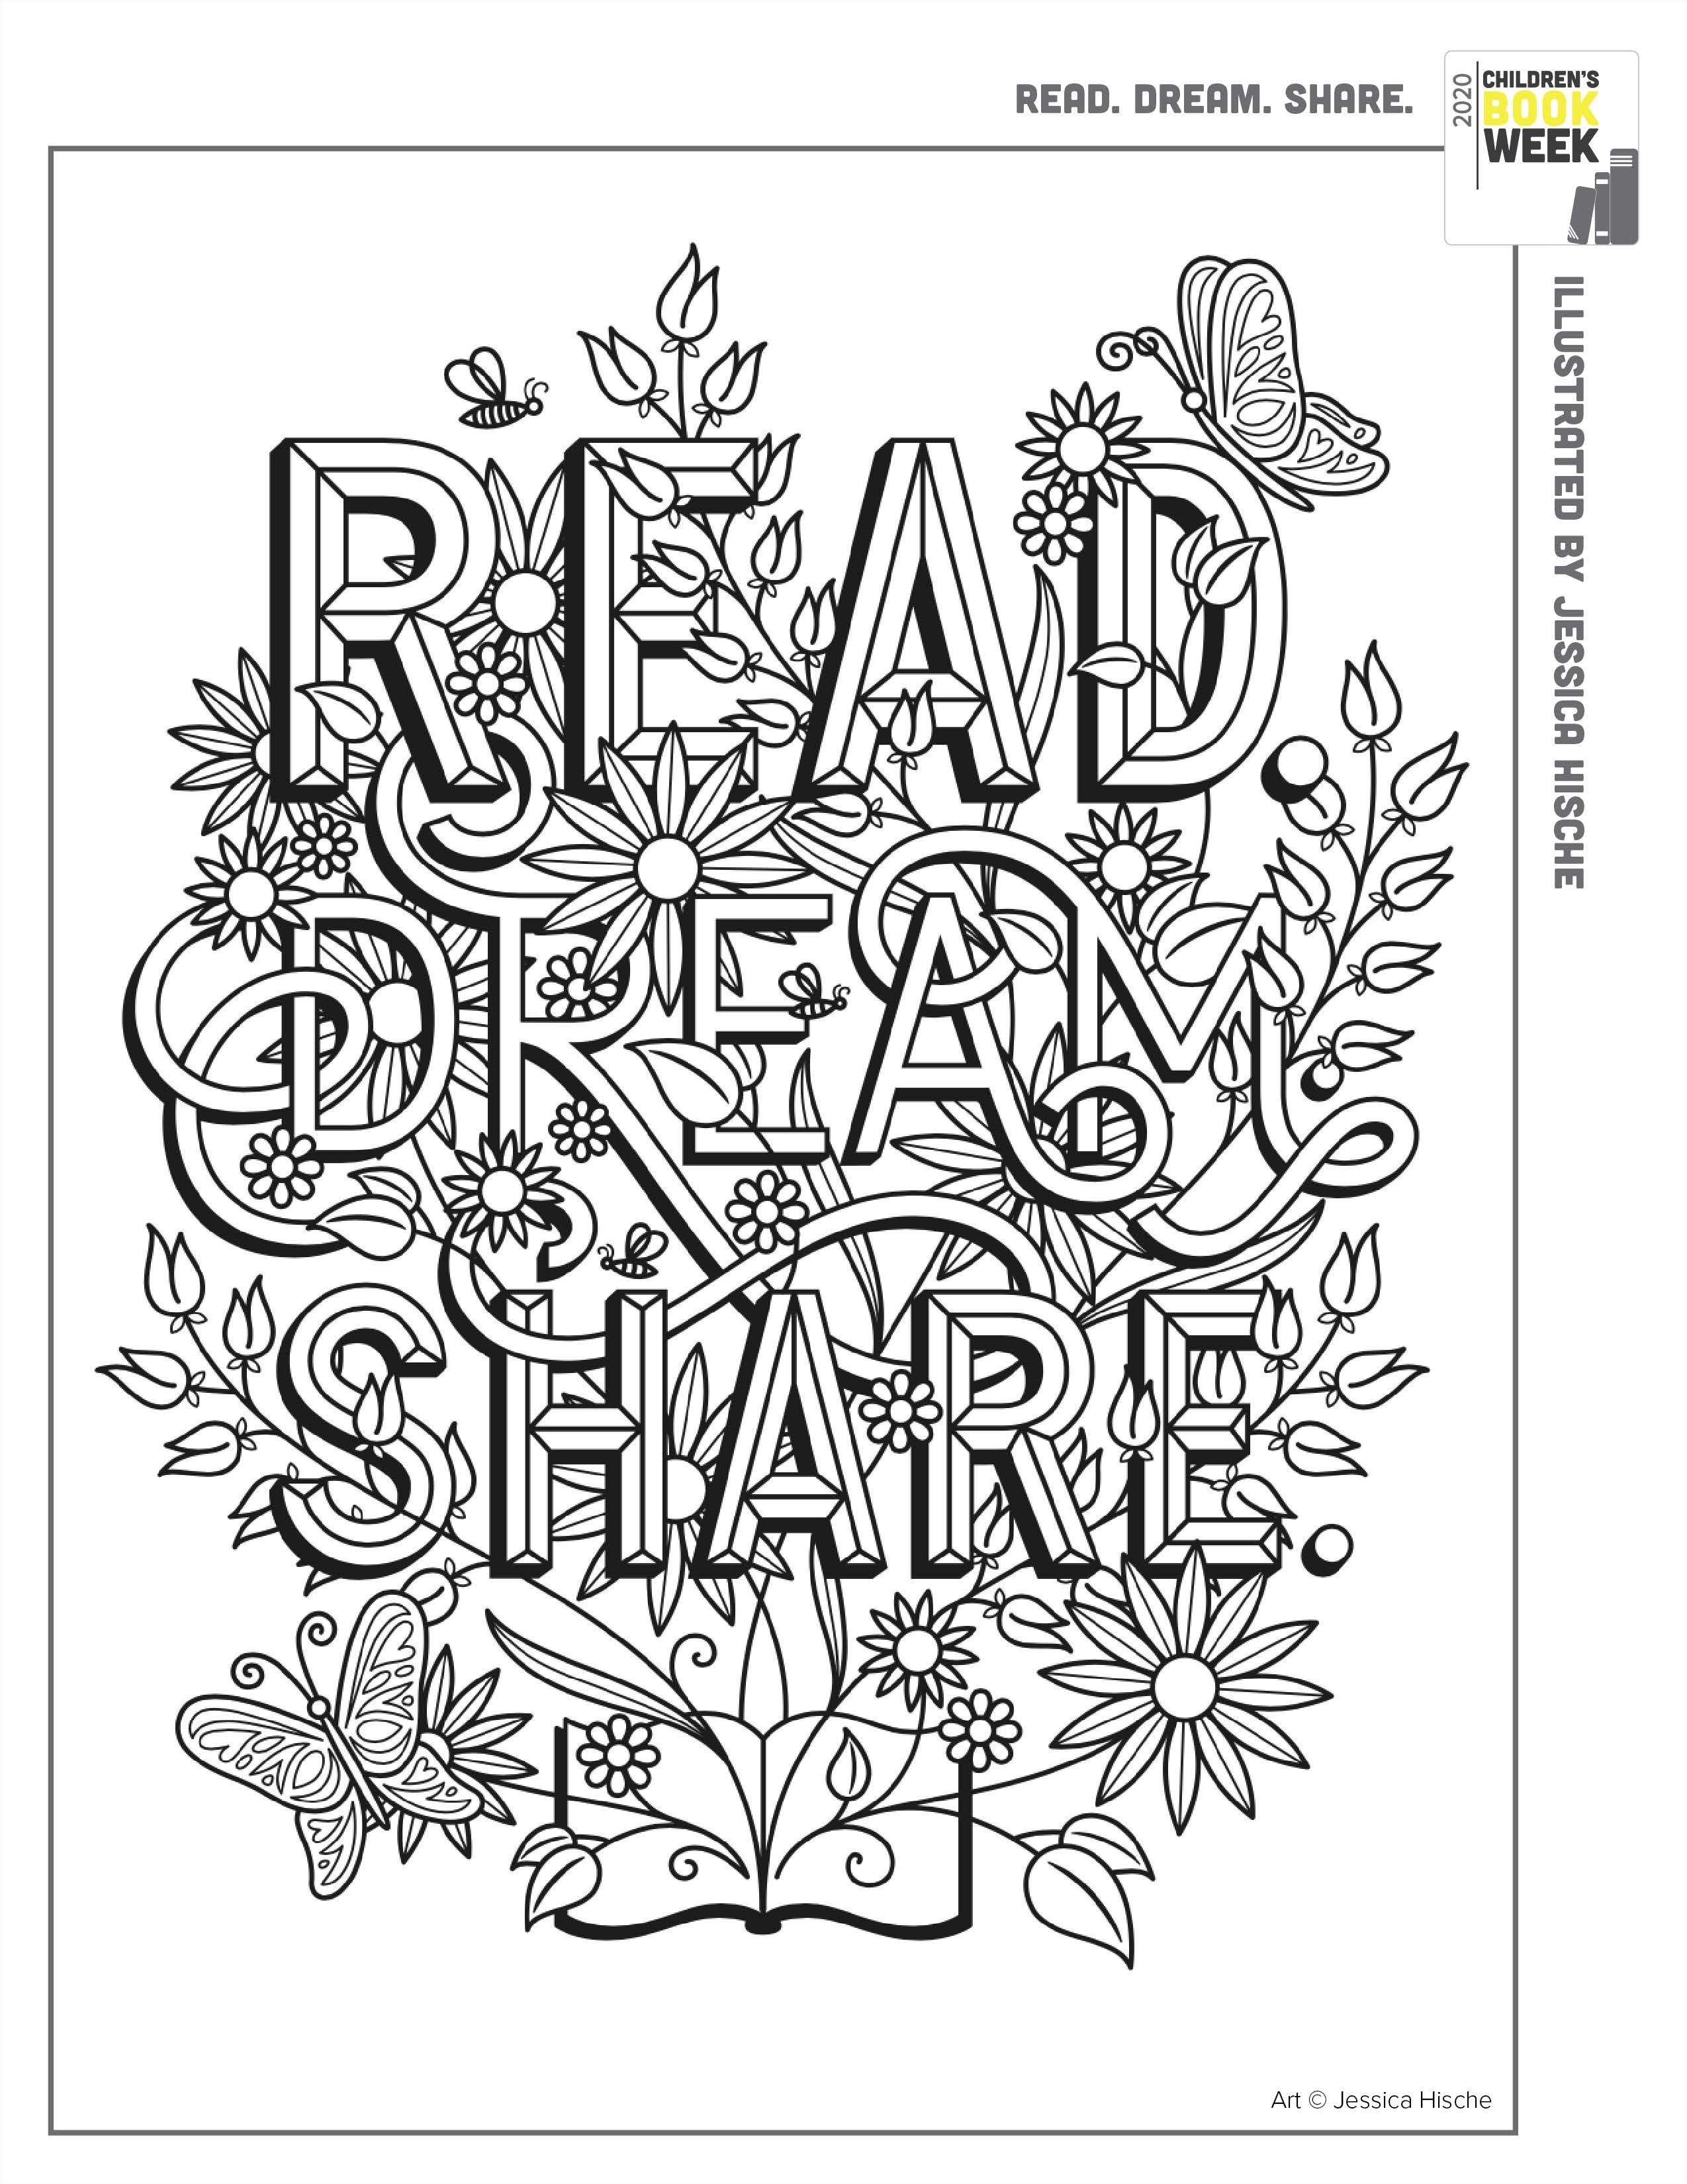 Tomorrow I Ll Be Brave Childrens Colouring Book Coloring Books Jessica Hische